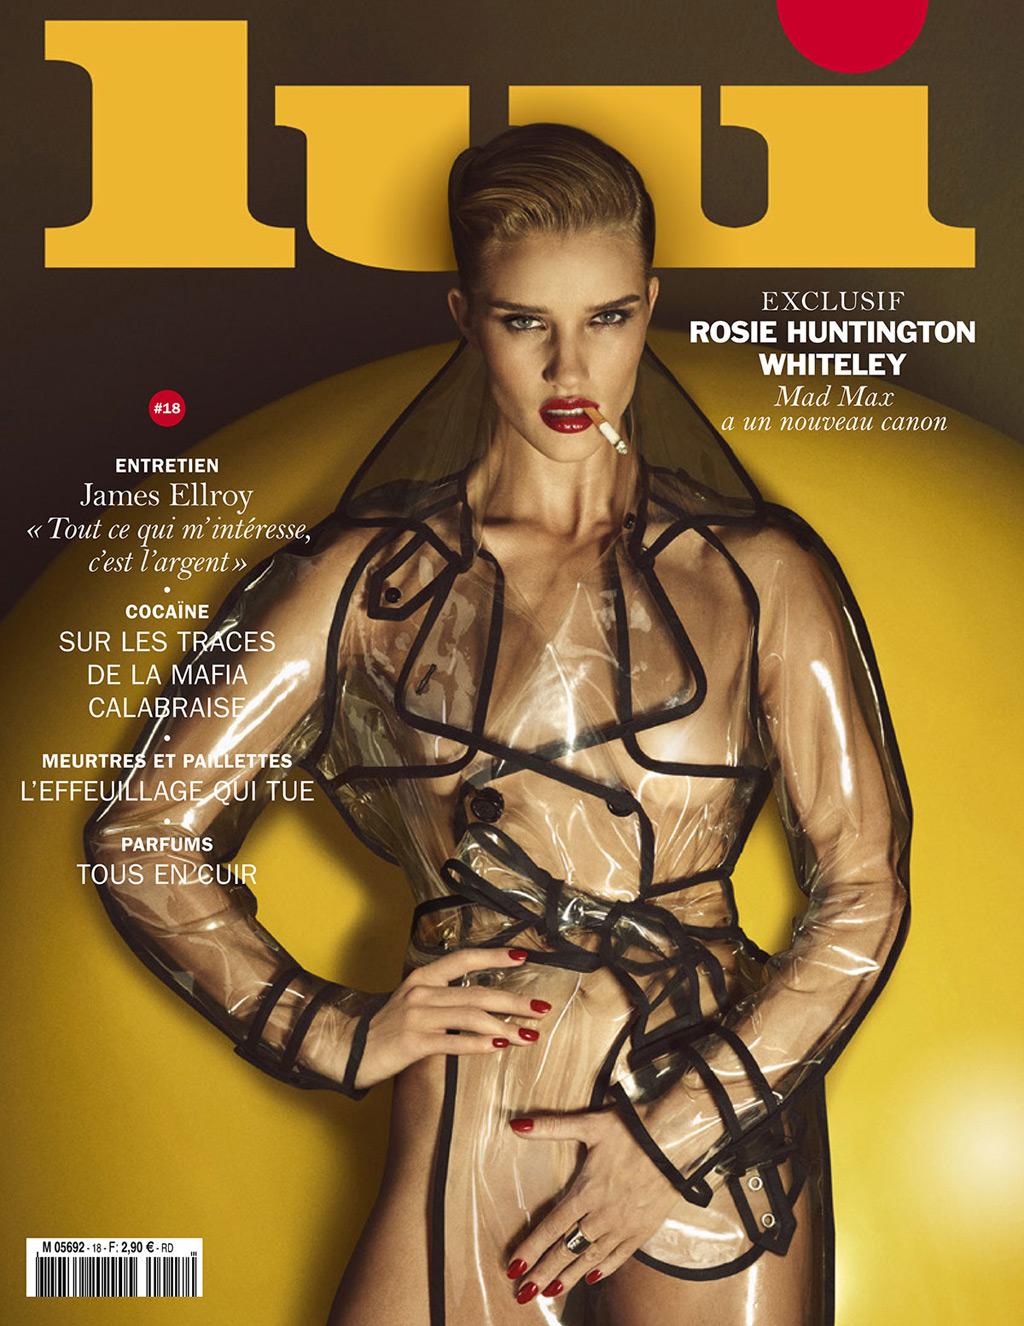 Rozi-Xantington-Uajtli-v-zhurnale-Lui-Magazine-12-foto